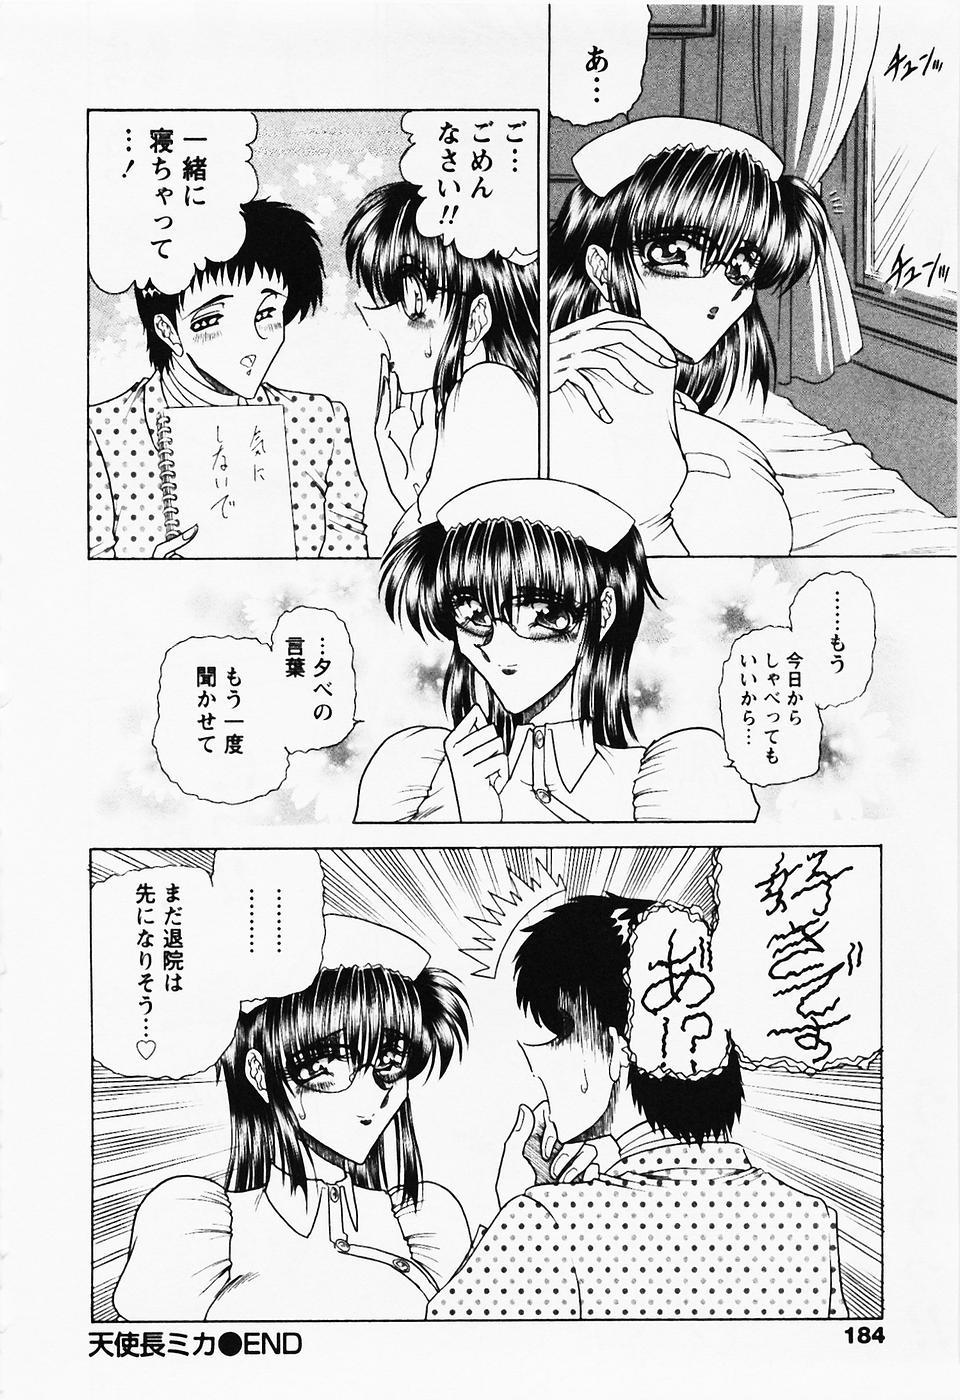 Seifuku Zanmai 182